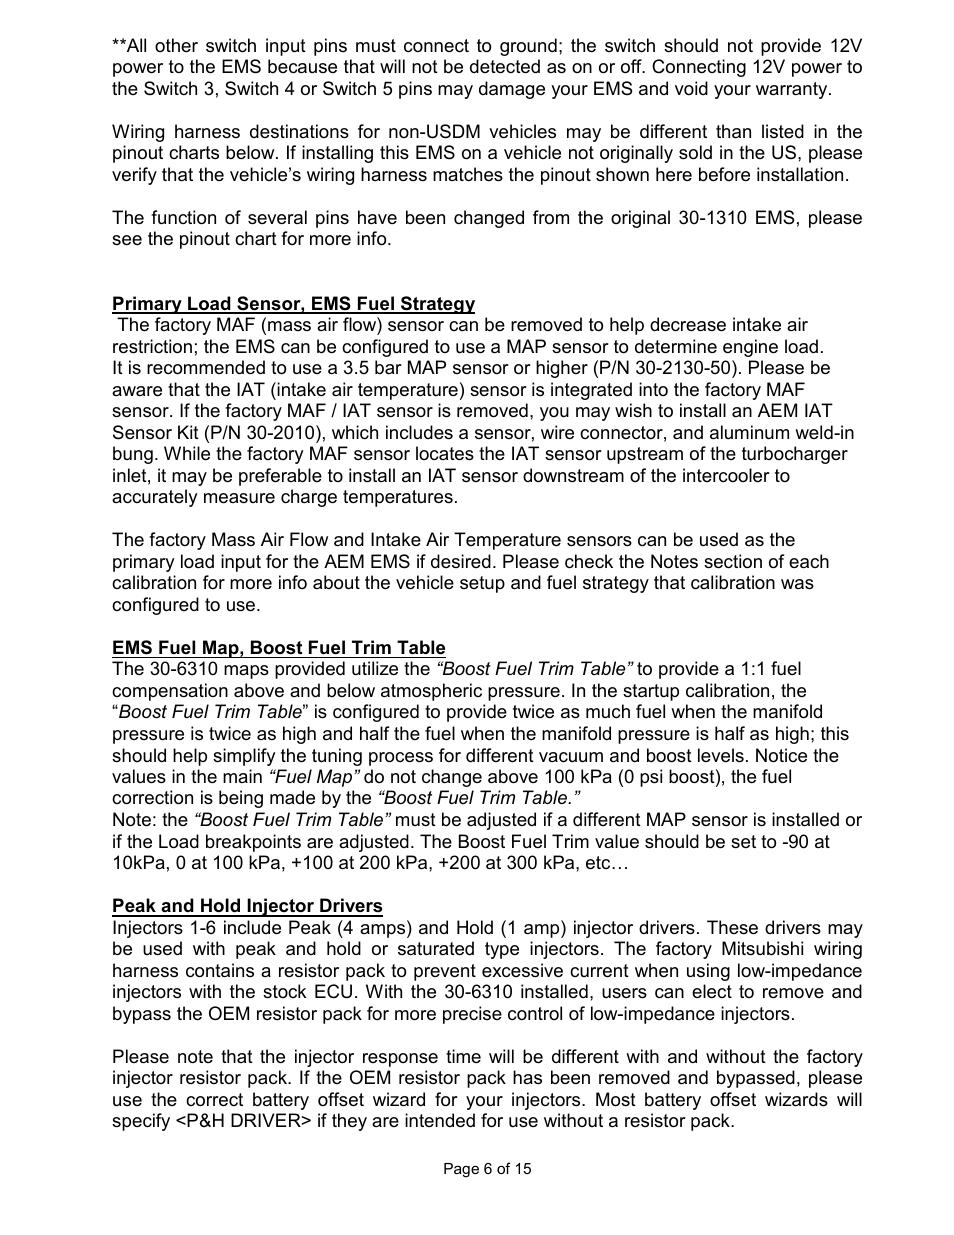 AEM 30-6310 Series 2 Plug & Play EMS User Manual | Page 6 / 15 on